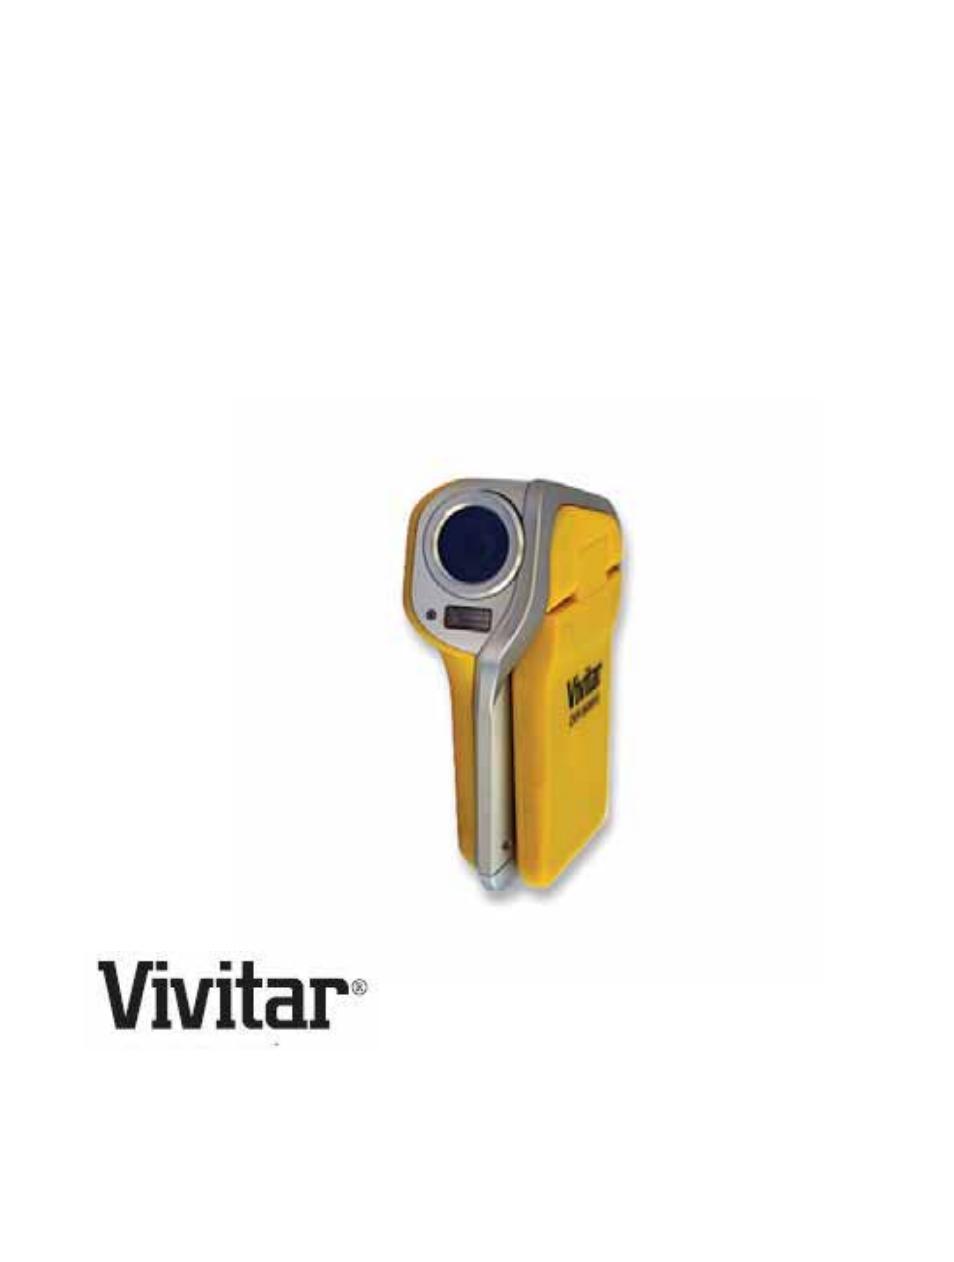 vivitar dvr 850w user manual 55 pages rh manualsdir com Vivitar DVR 610 HD Vivitar DVR 925Hd